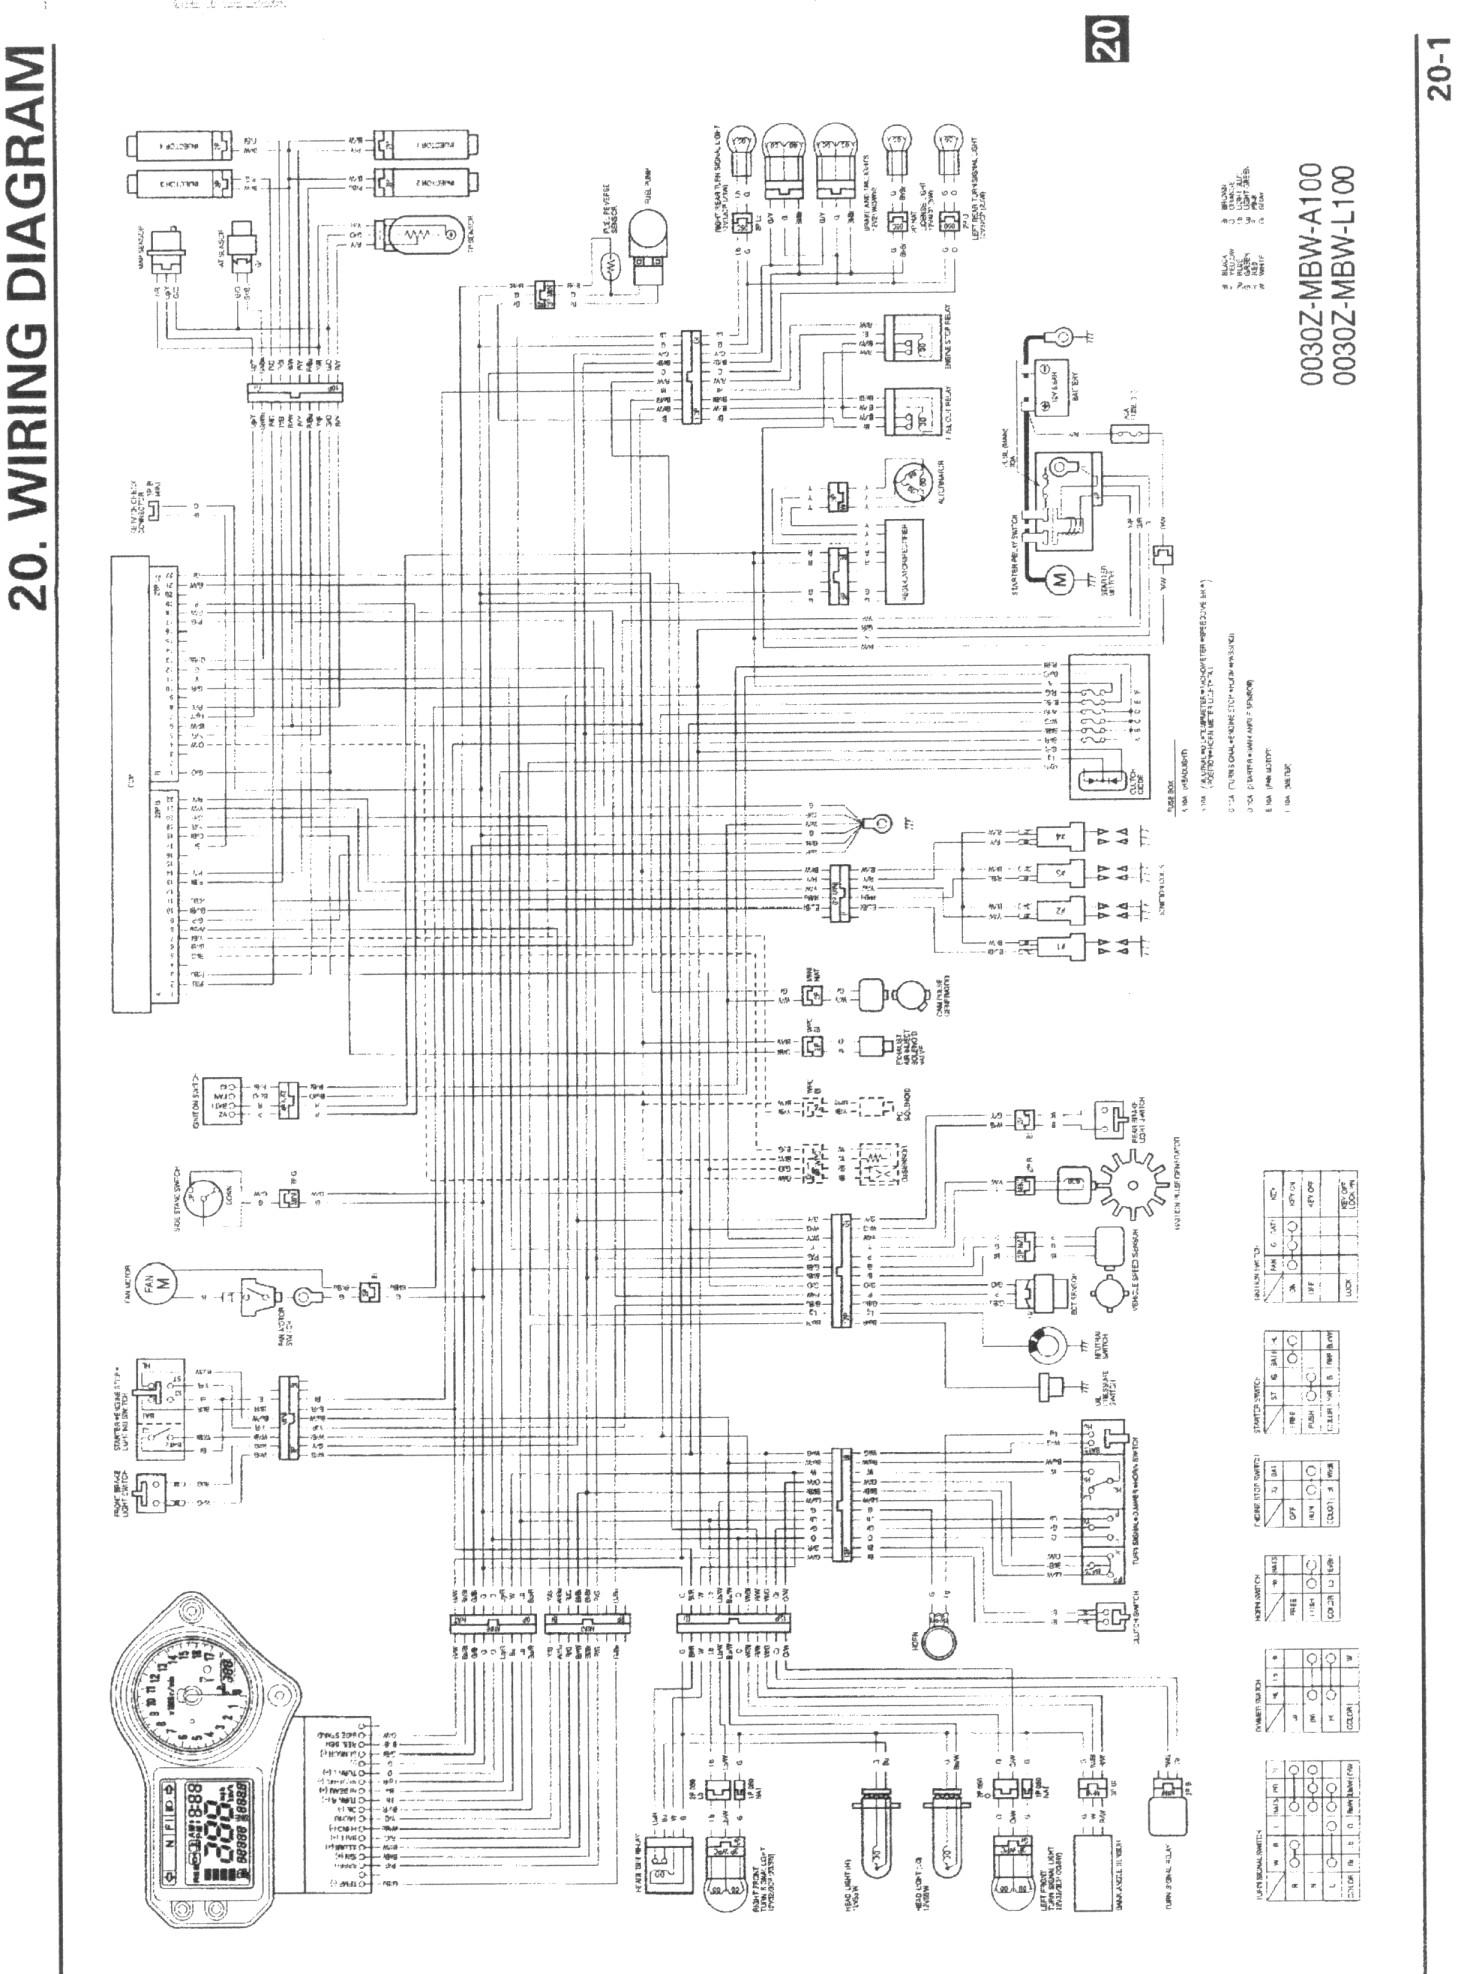 Honda F4i Wiring Diagram on